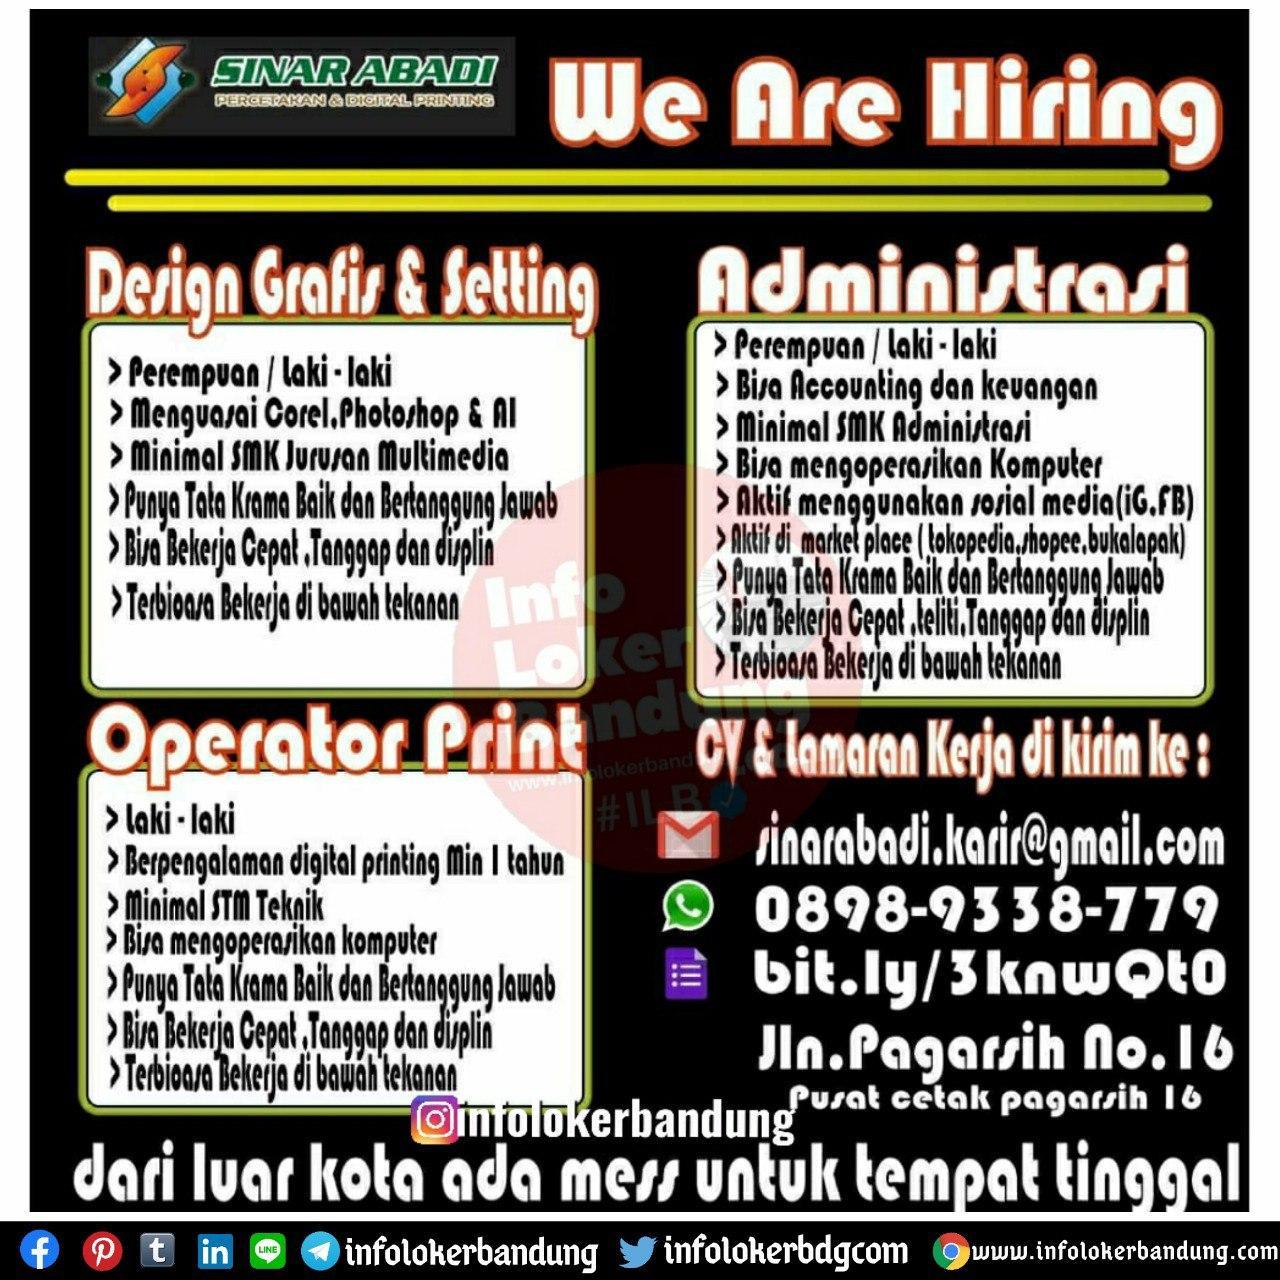 Lowongan Kerja Sinar Abadi ( Pusat Cetak Pagarsih 16 ) Bandung Agustus 2020